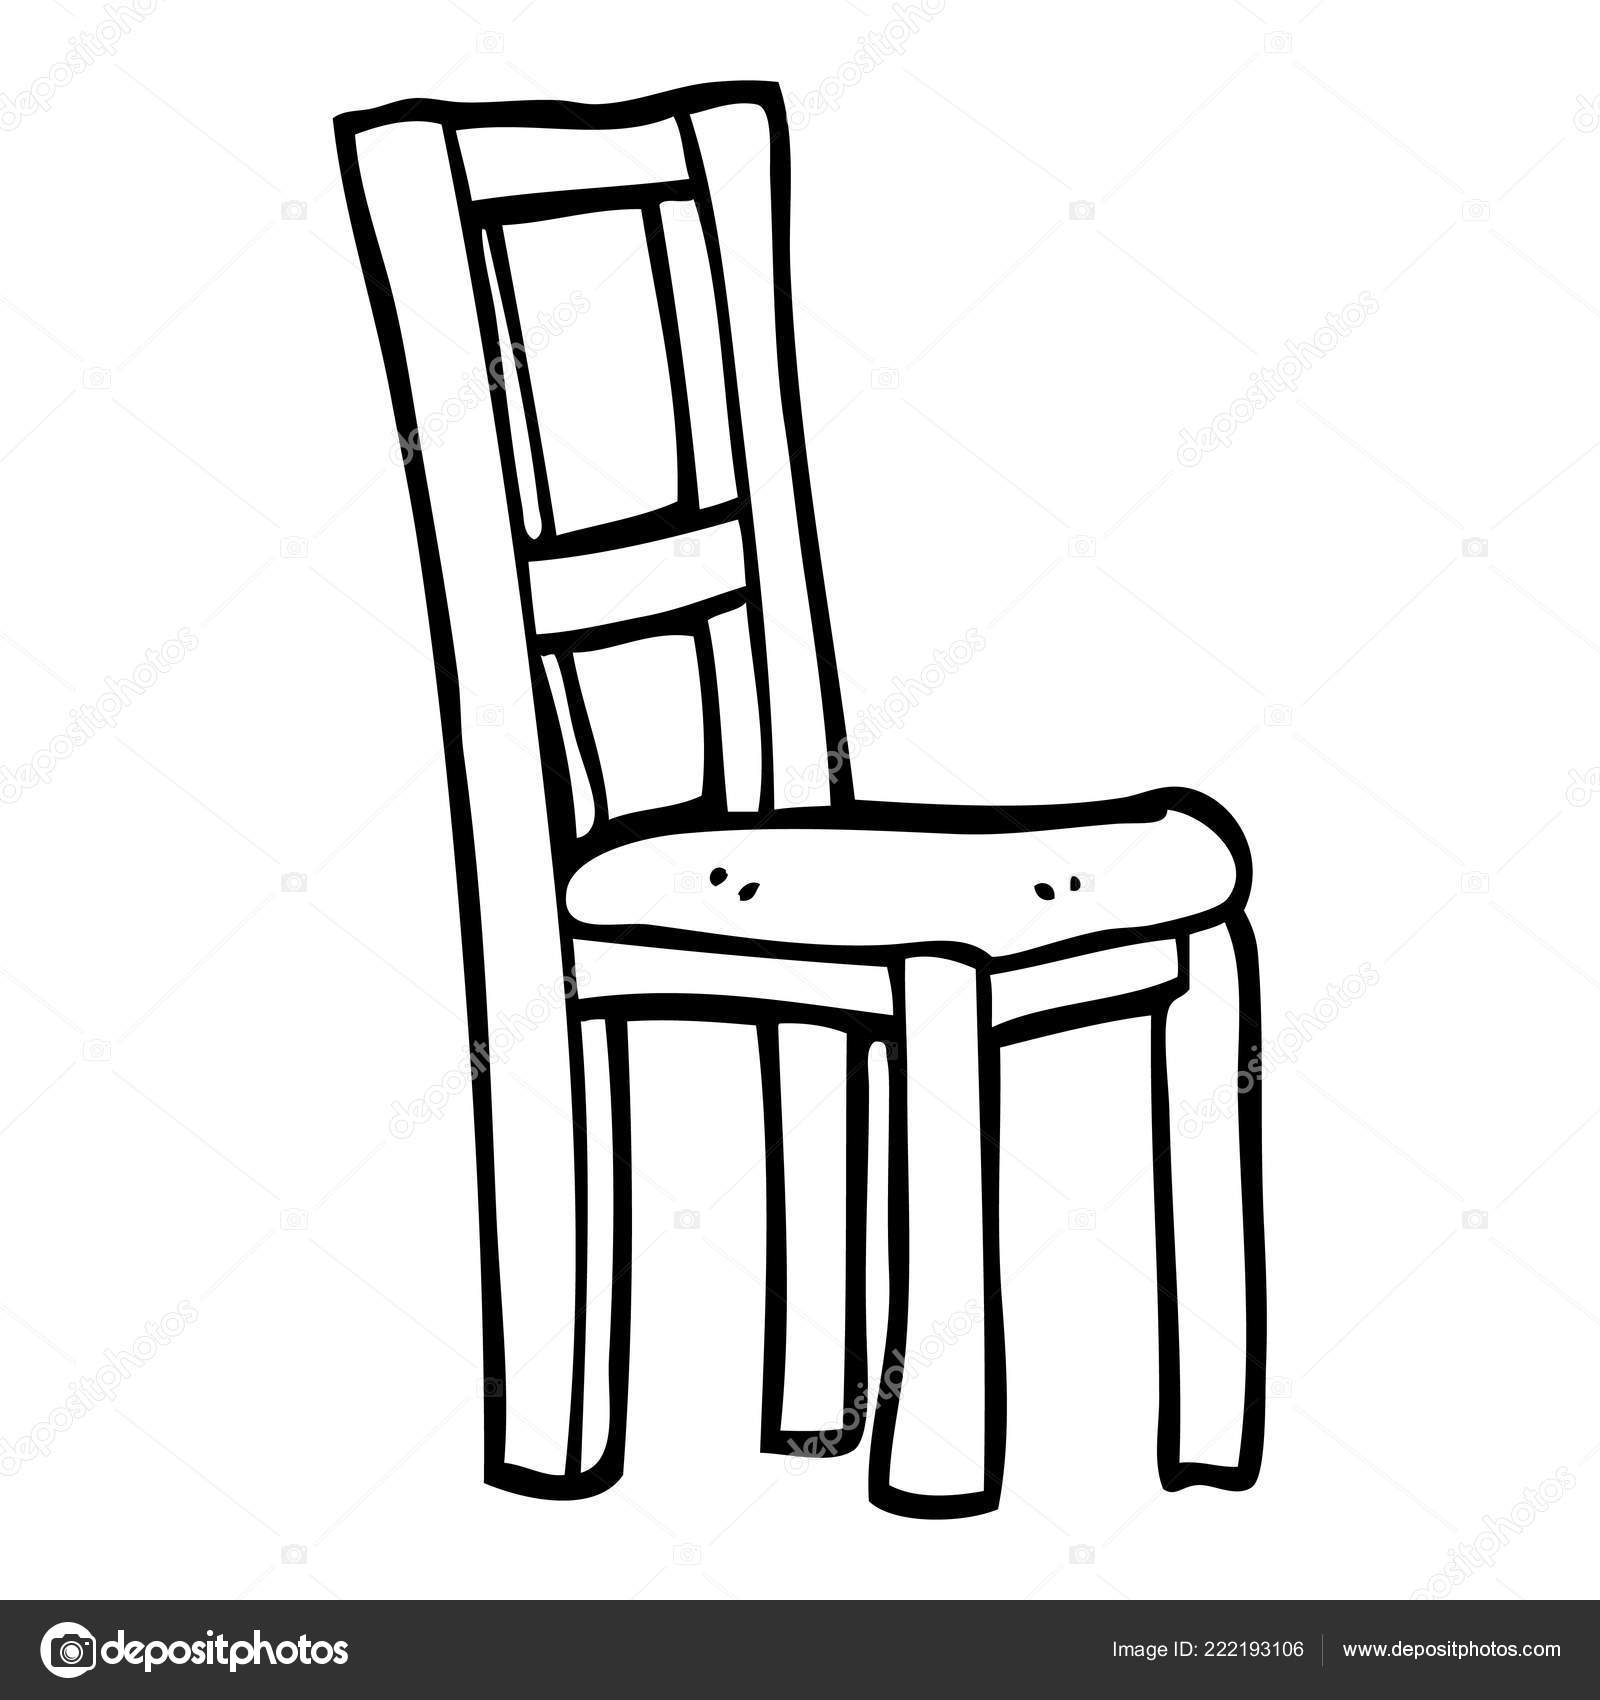 Black White Cartoon Wooden Chair Stock Vector C Lineartestpilot 222193106